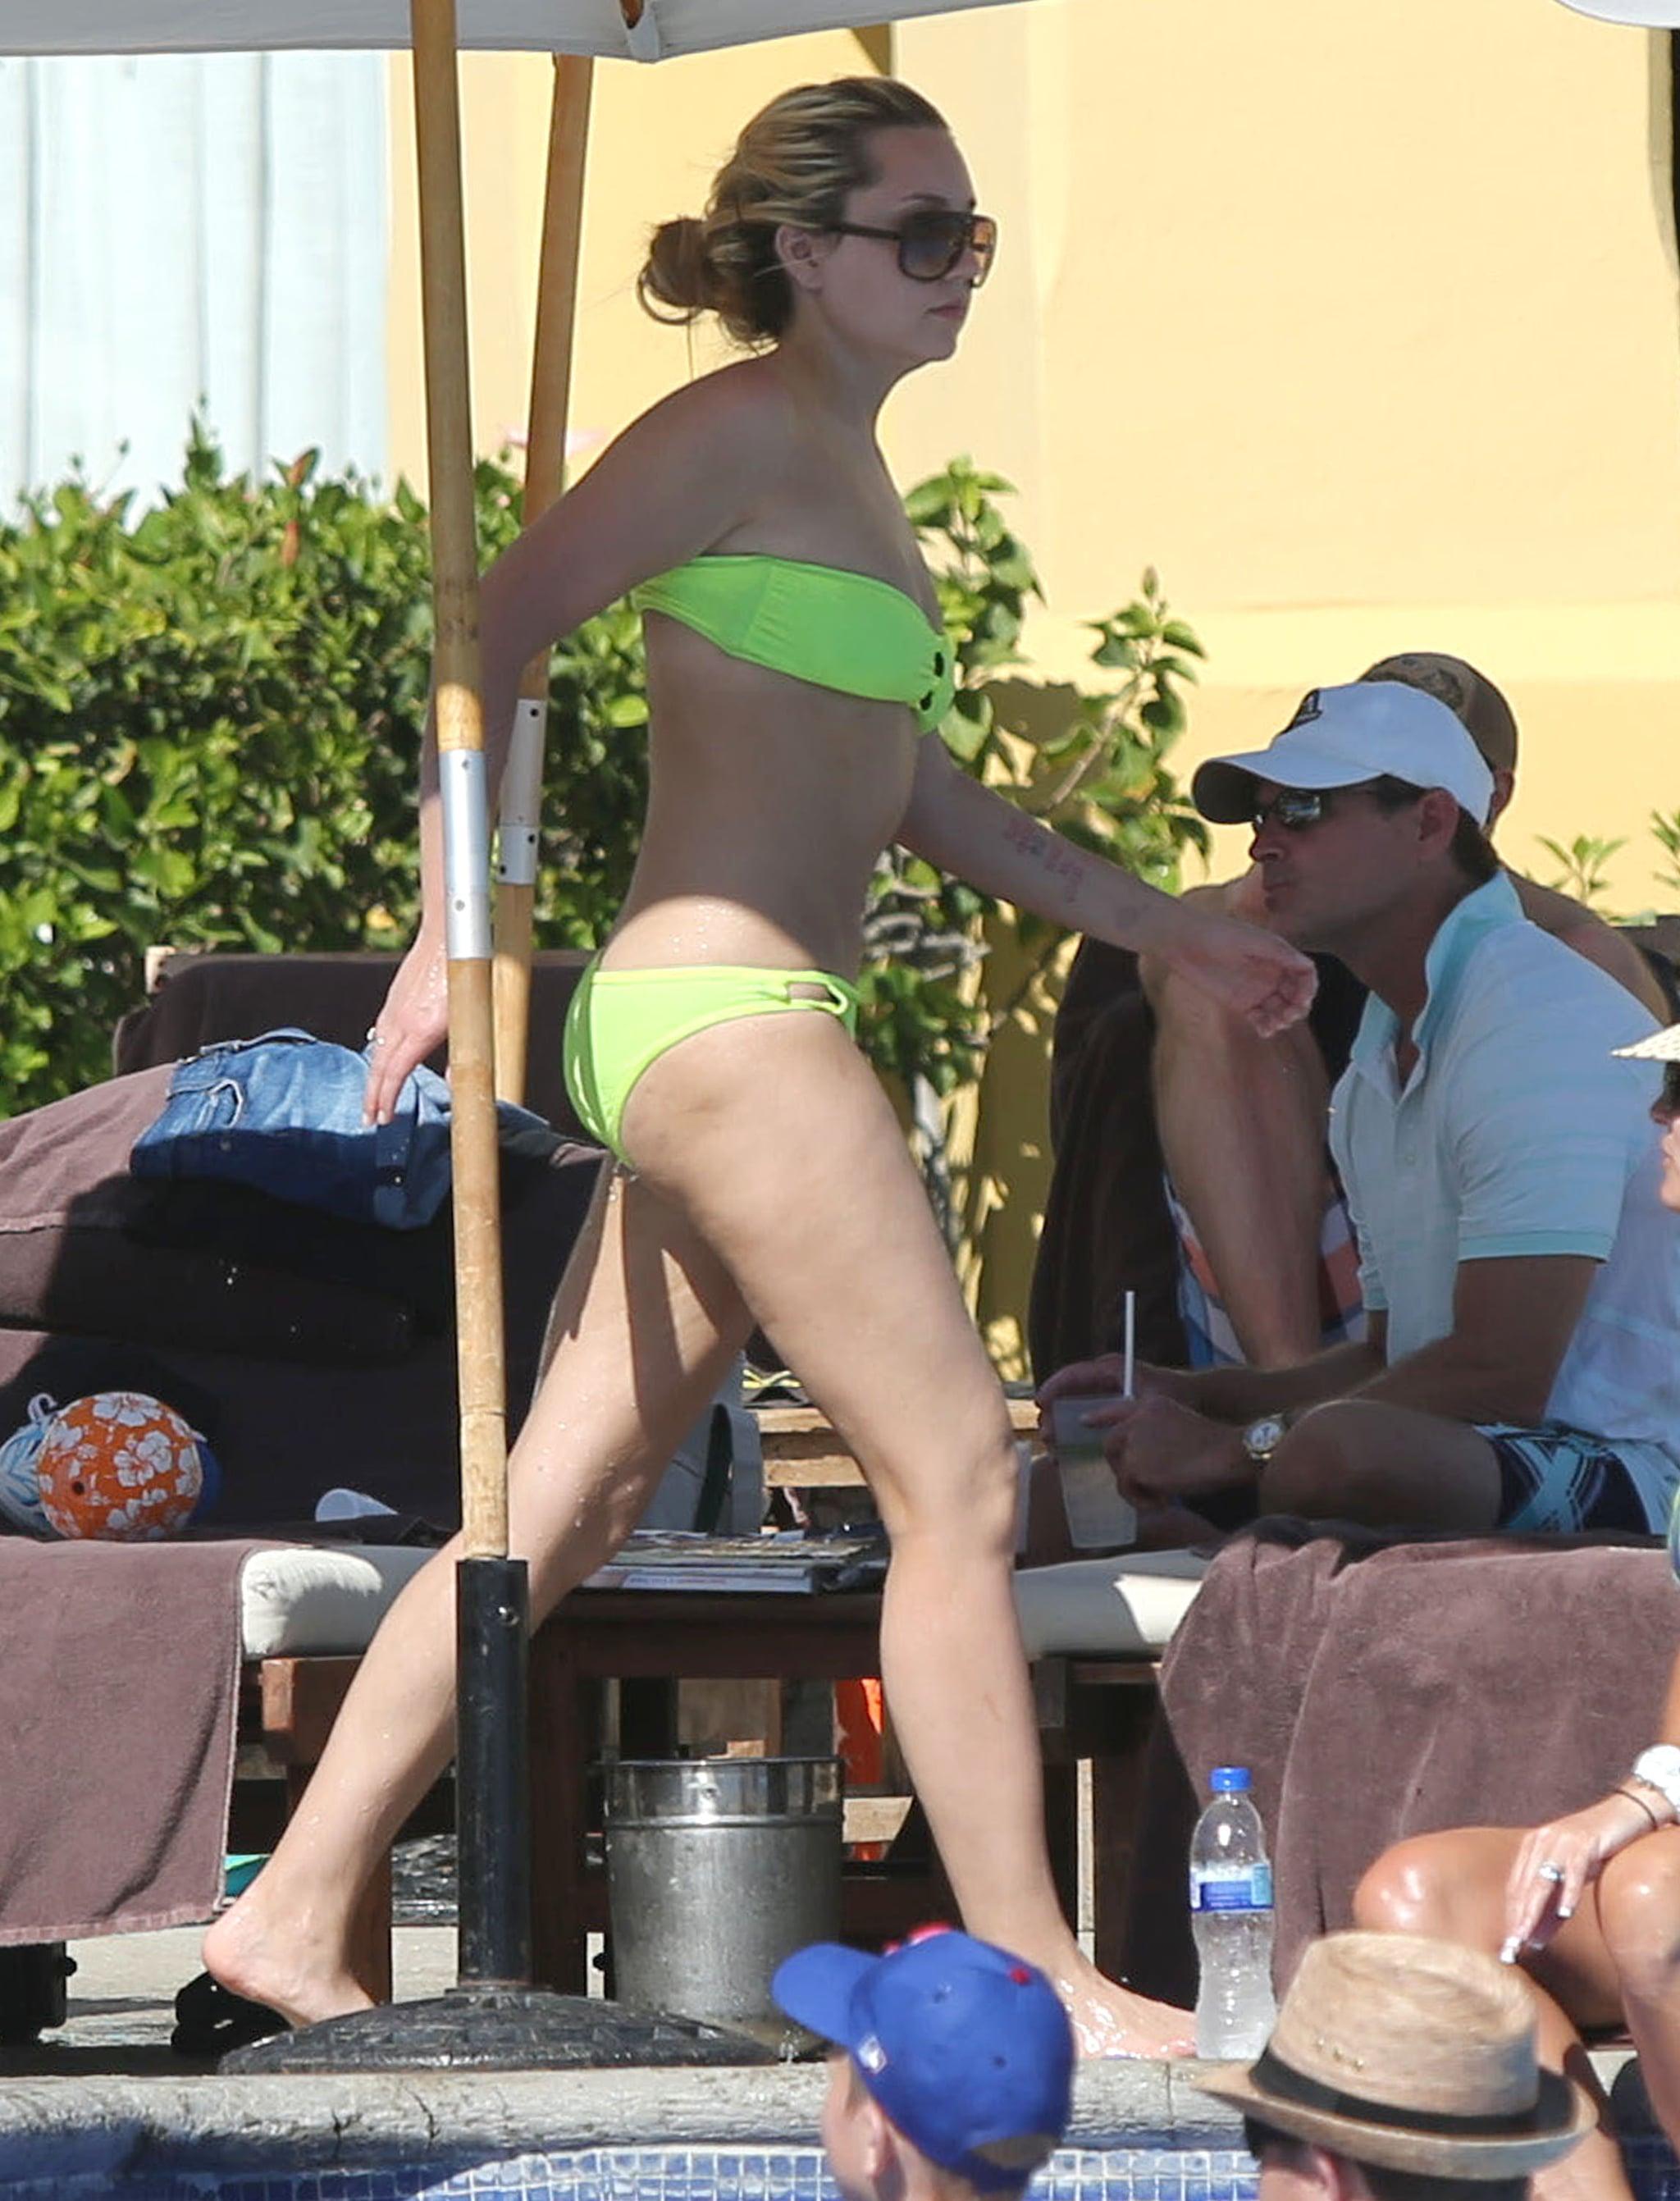 Hello, Amanda! The Actress Unleashes Her Bikini Body in Mexico